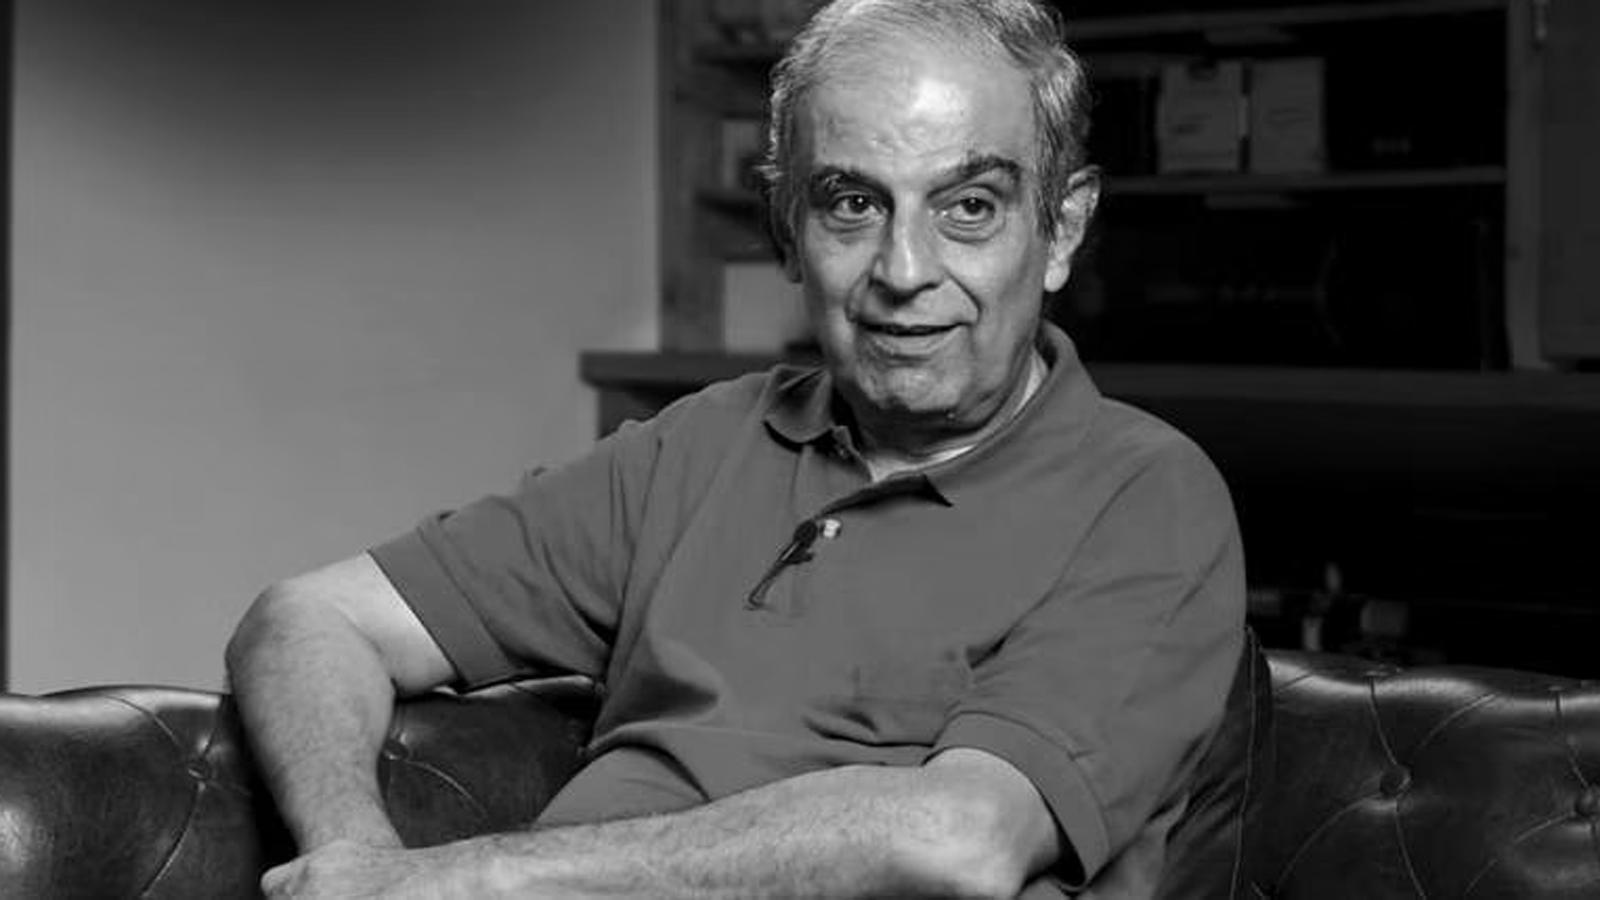 film-critic-rashid-irani-passes-away-at-74-bollywood-celebrities-pay-tribute